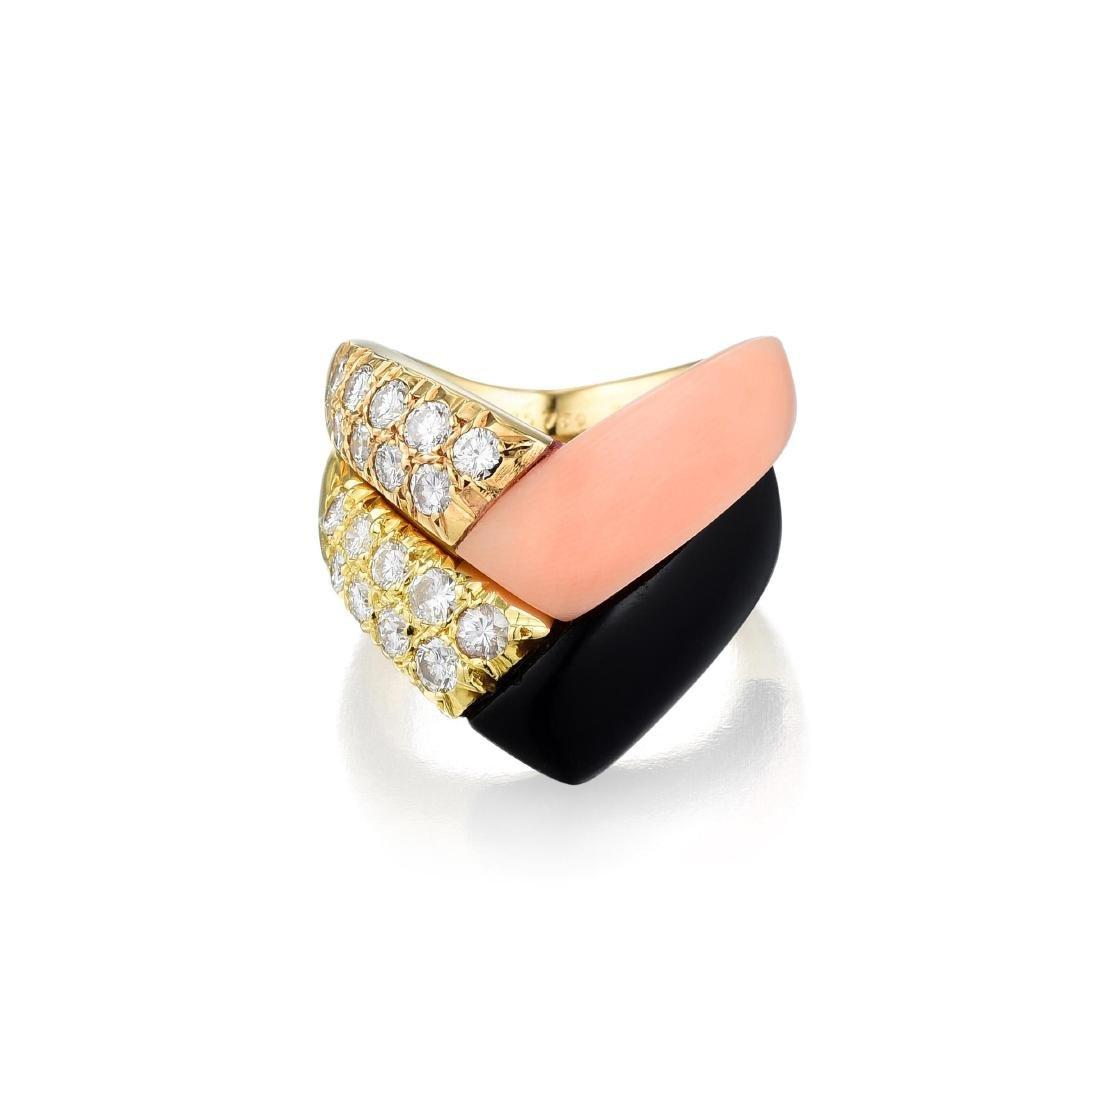 Van Cleef & Arpels Coral and Onyx Diamond Ring Stack